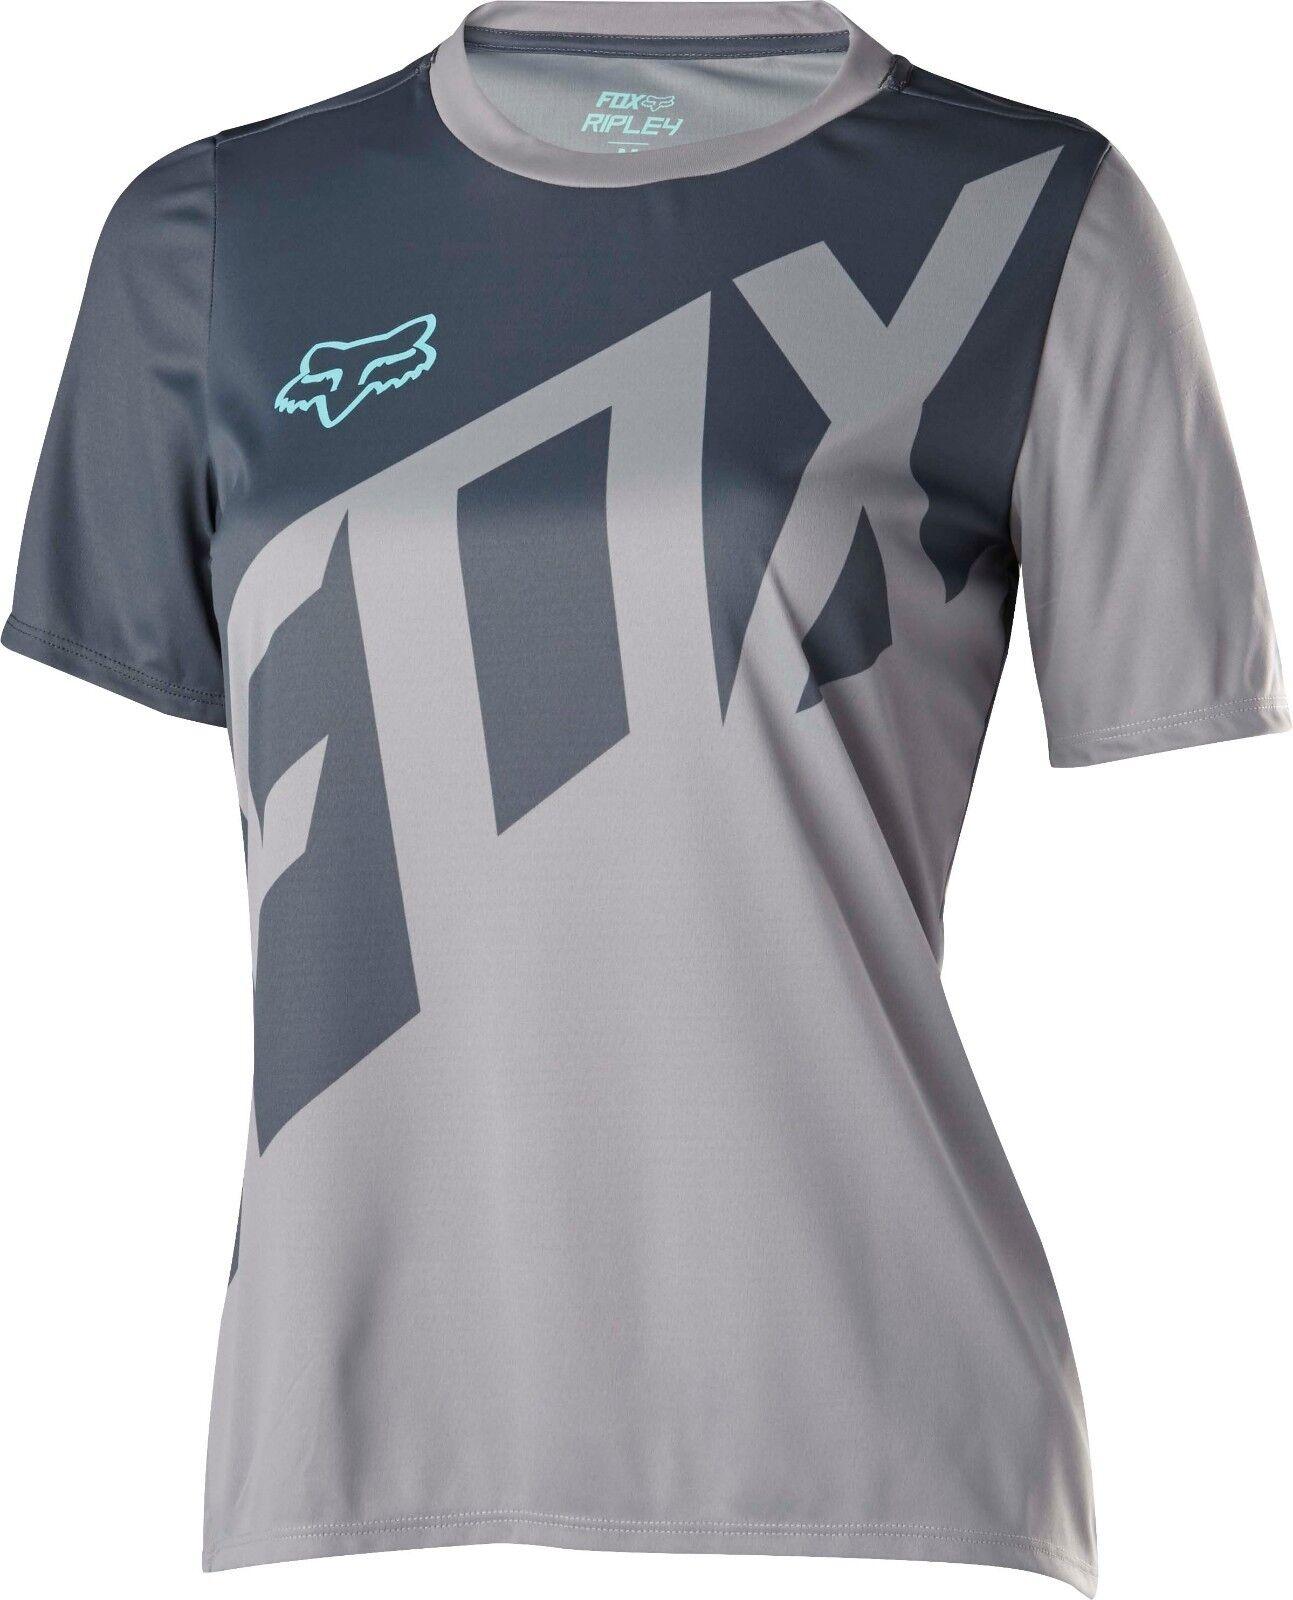 Fox  Racing Womens Ripley s s Jersey Grey  no hesitation!buy now!